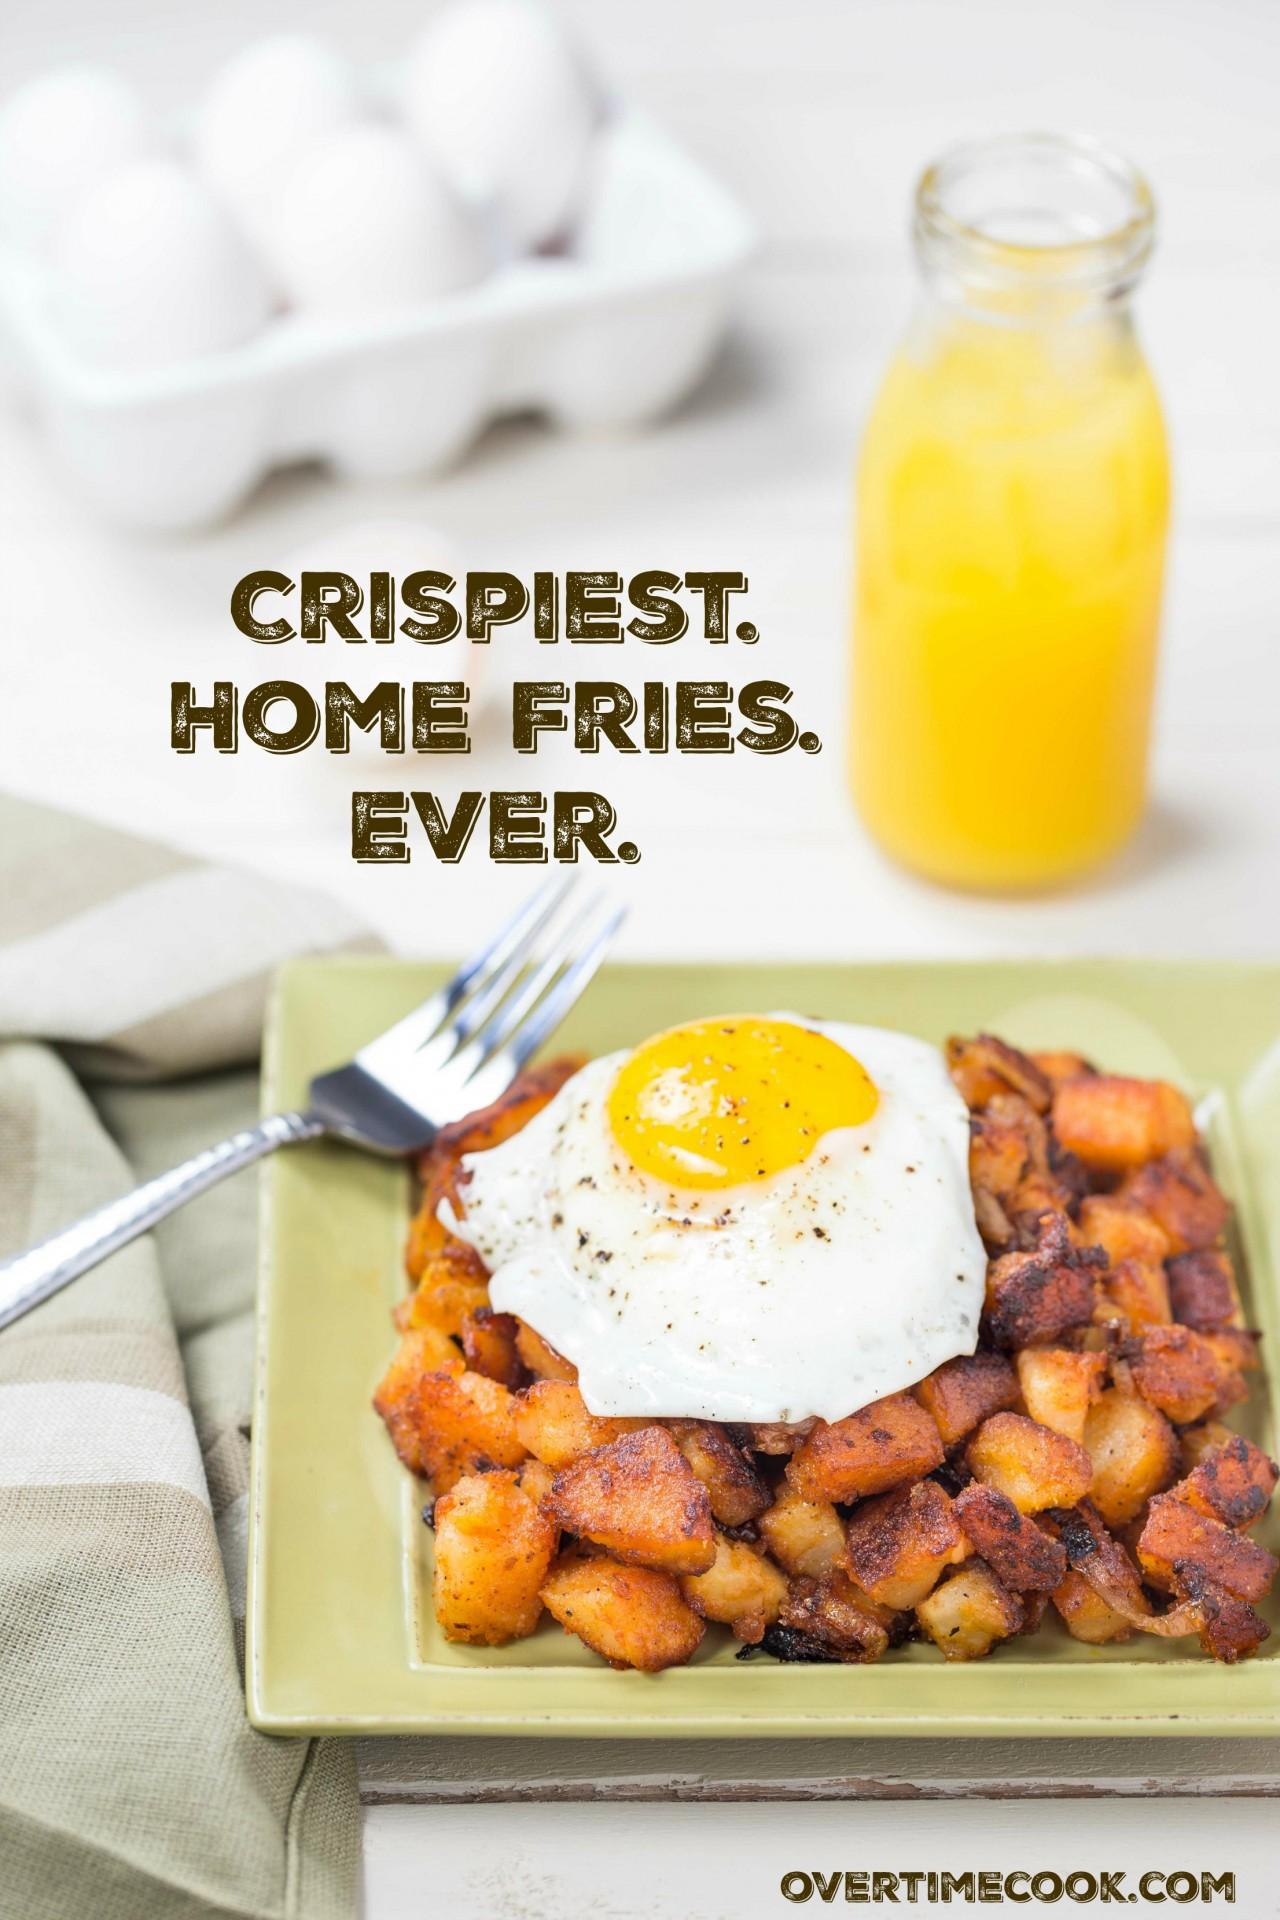 Crispiest-Home-Fries-Ever.jpg